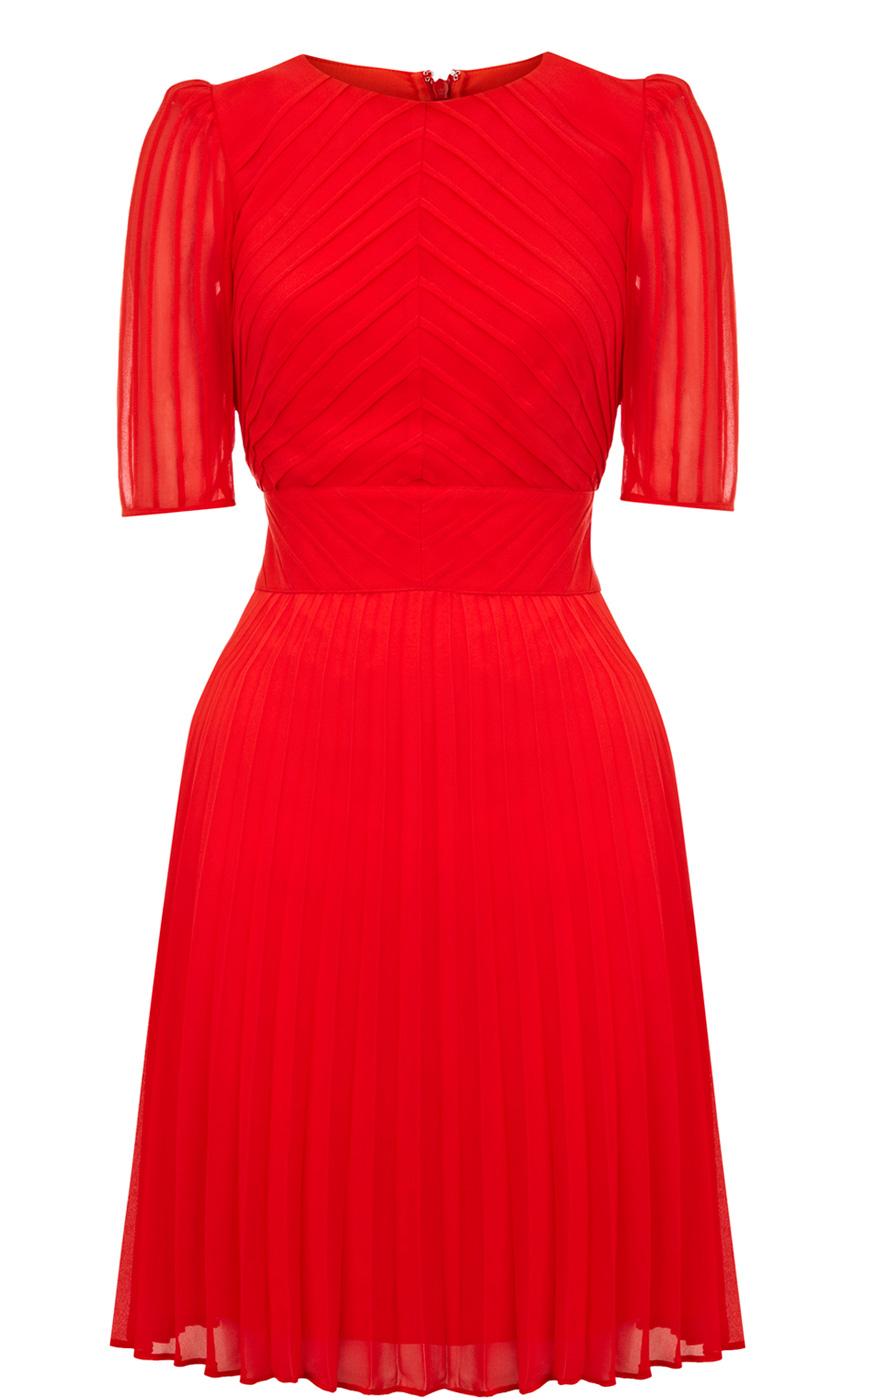 Karen Millen Red Pintuck Cute Dress Womens 758 - آداب میزبانی و میهمانی در بلندترین شب سال(یلدا)